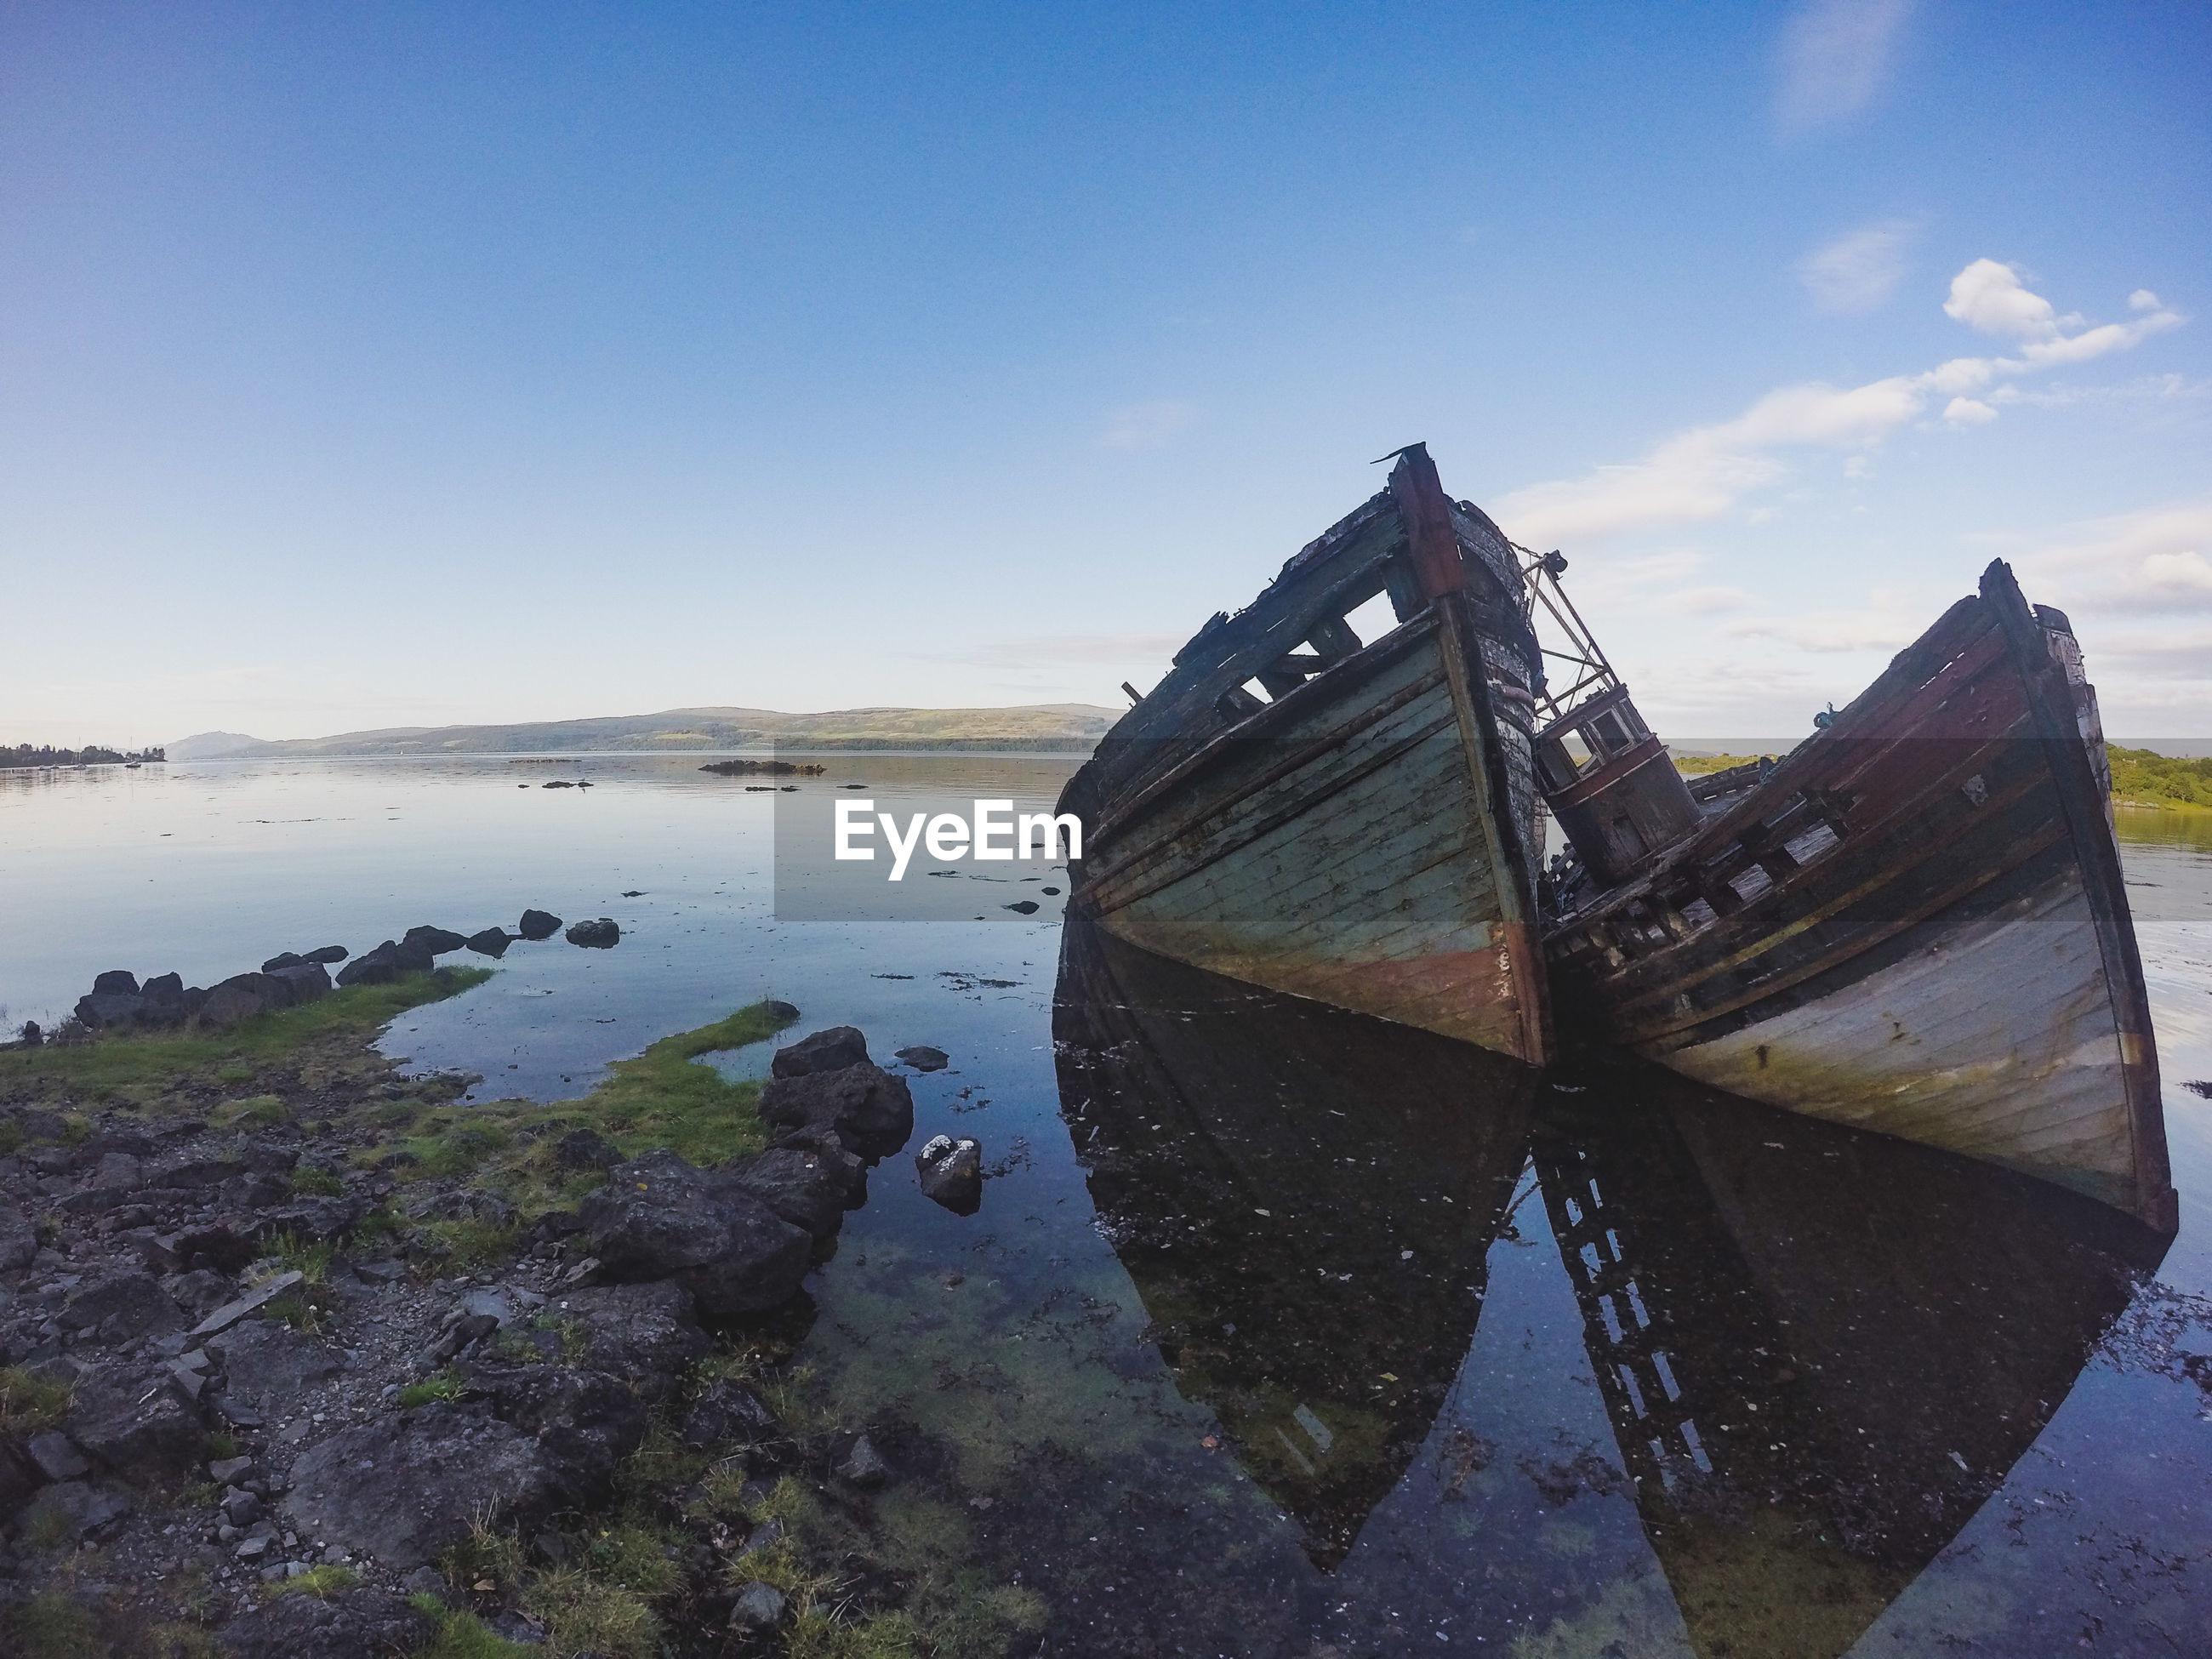 Boat wreck on beach against sky